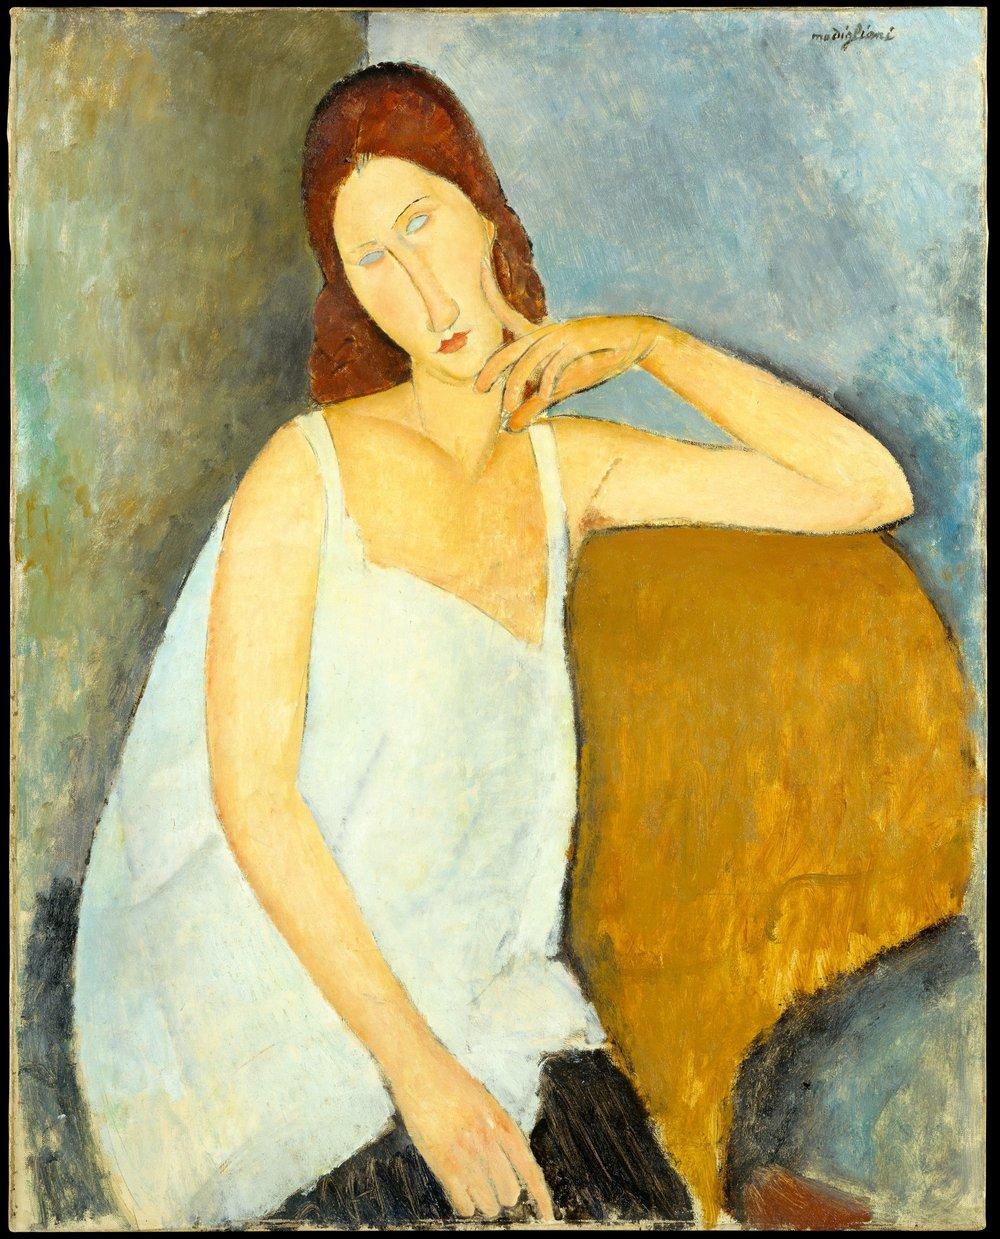 Amedeo Modigliani. Portrait of Jeanne Hébuterne. 1919. Courtesy of the Metropolitan Museum.